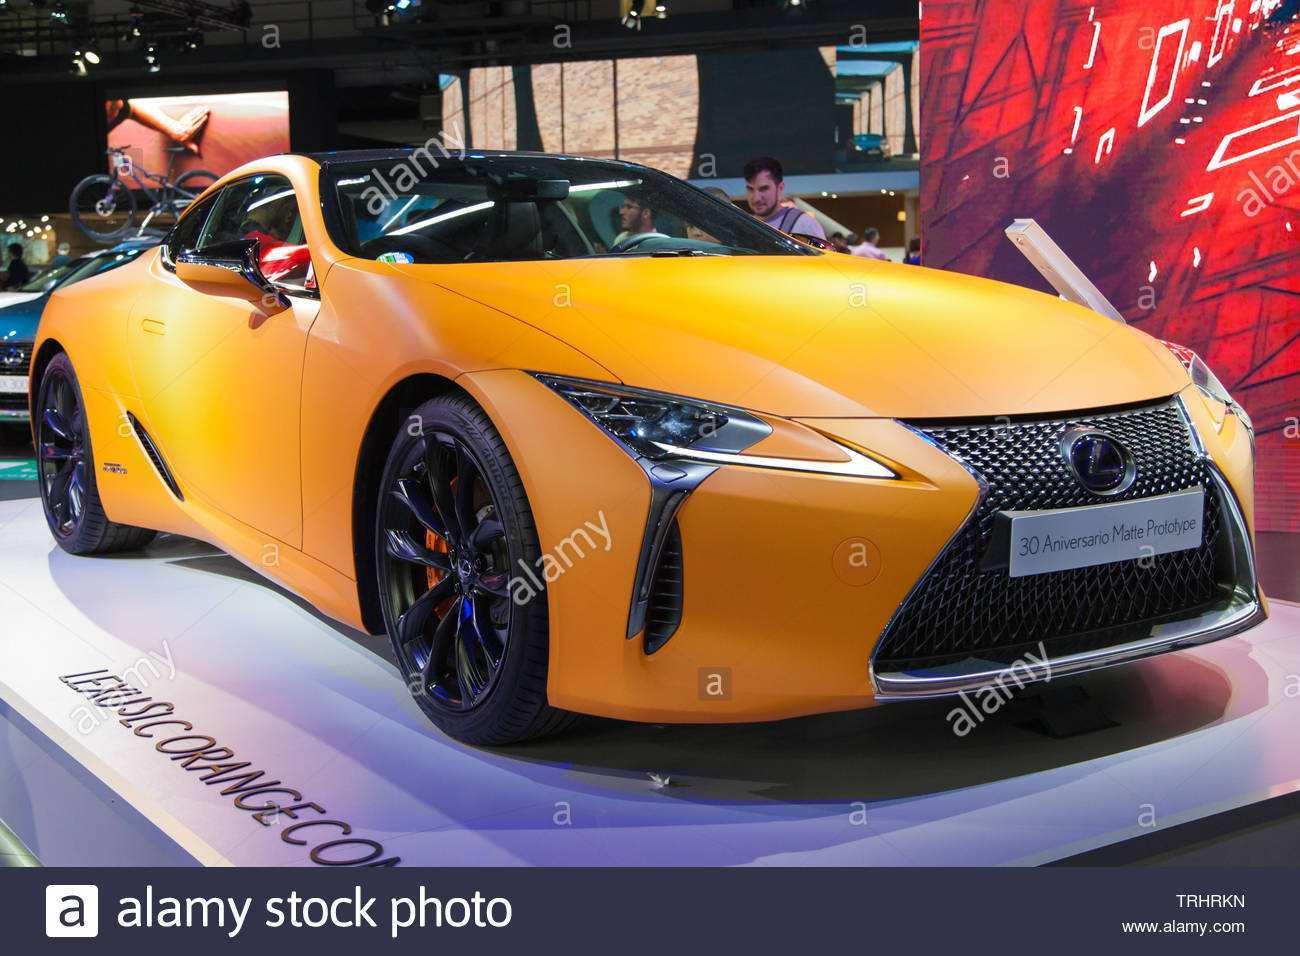 32 The 2019 Lexus Lf Lc Exterior and Interior for 2019 Lexus Lf Lc